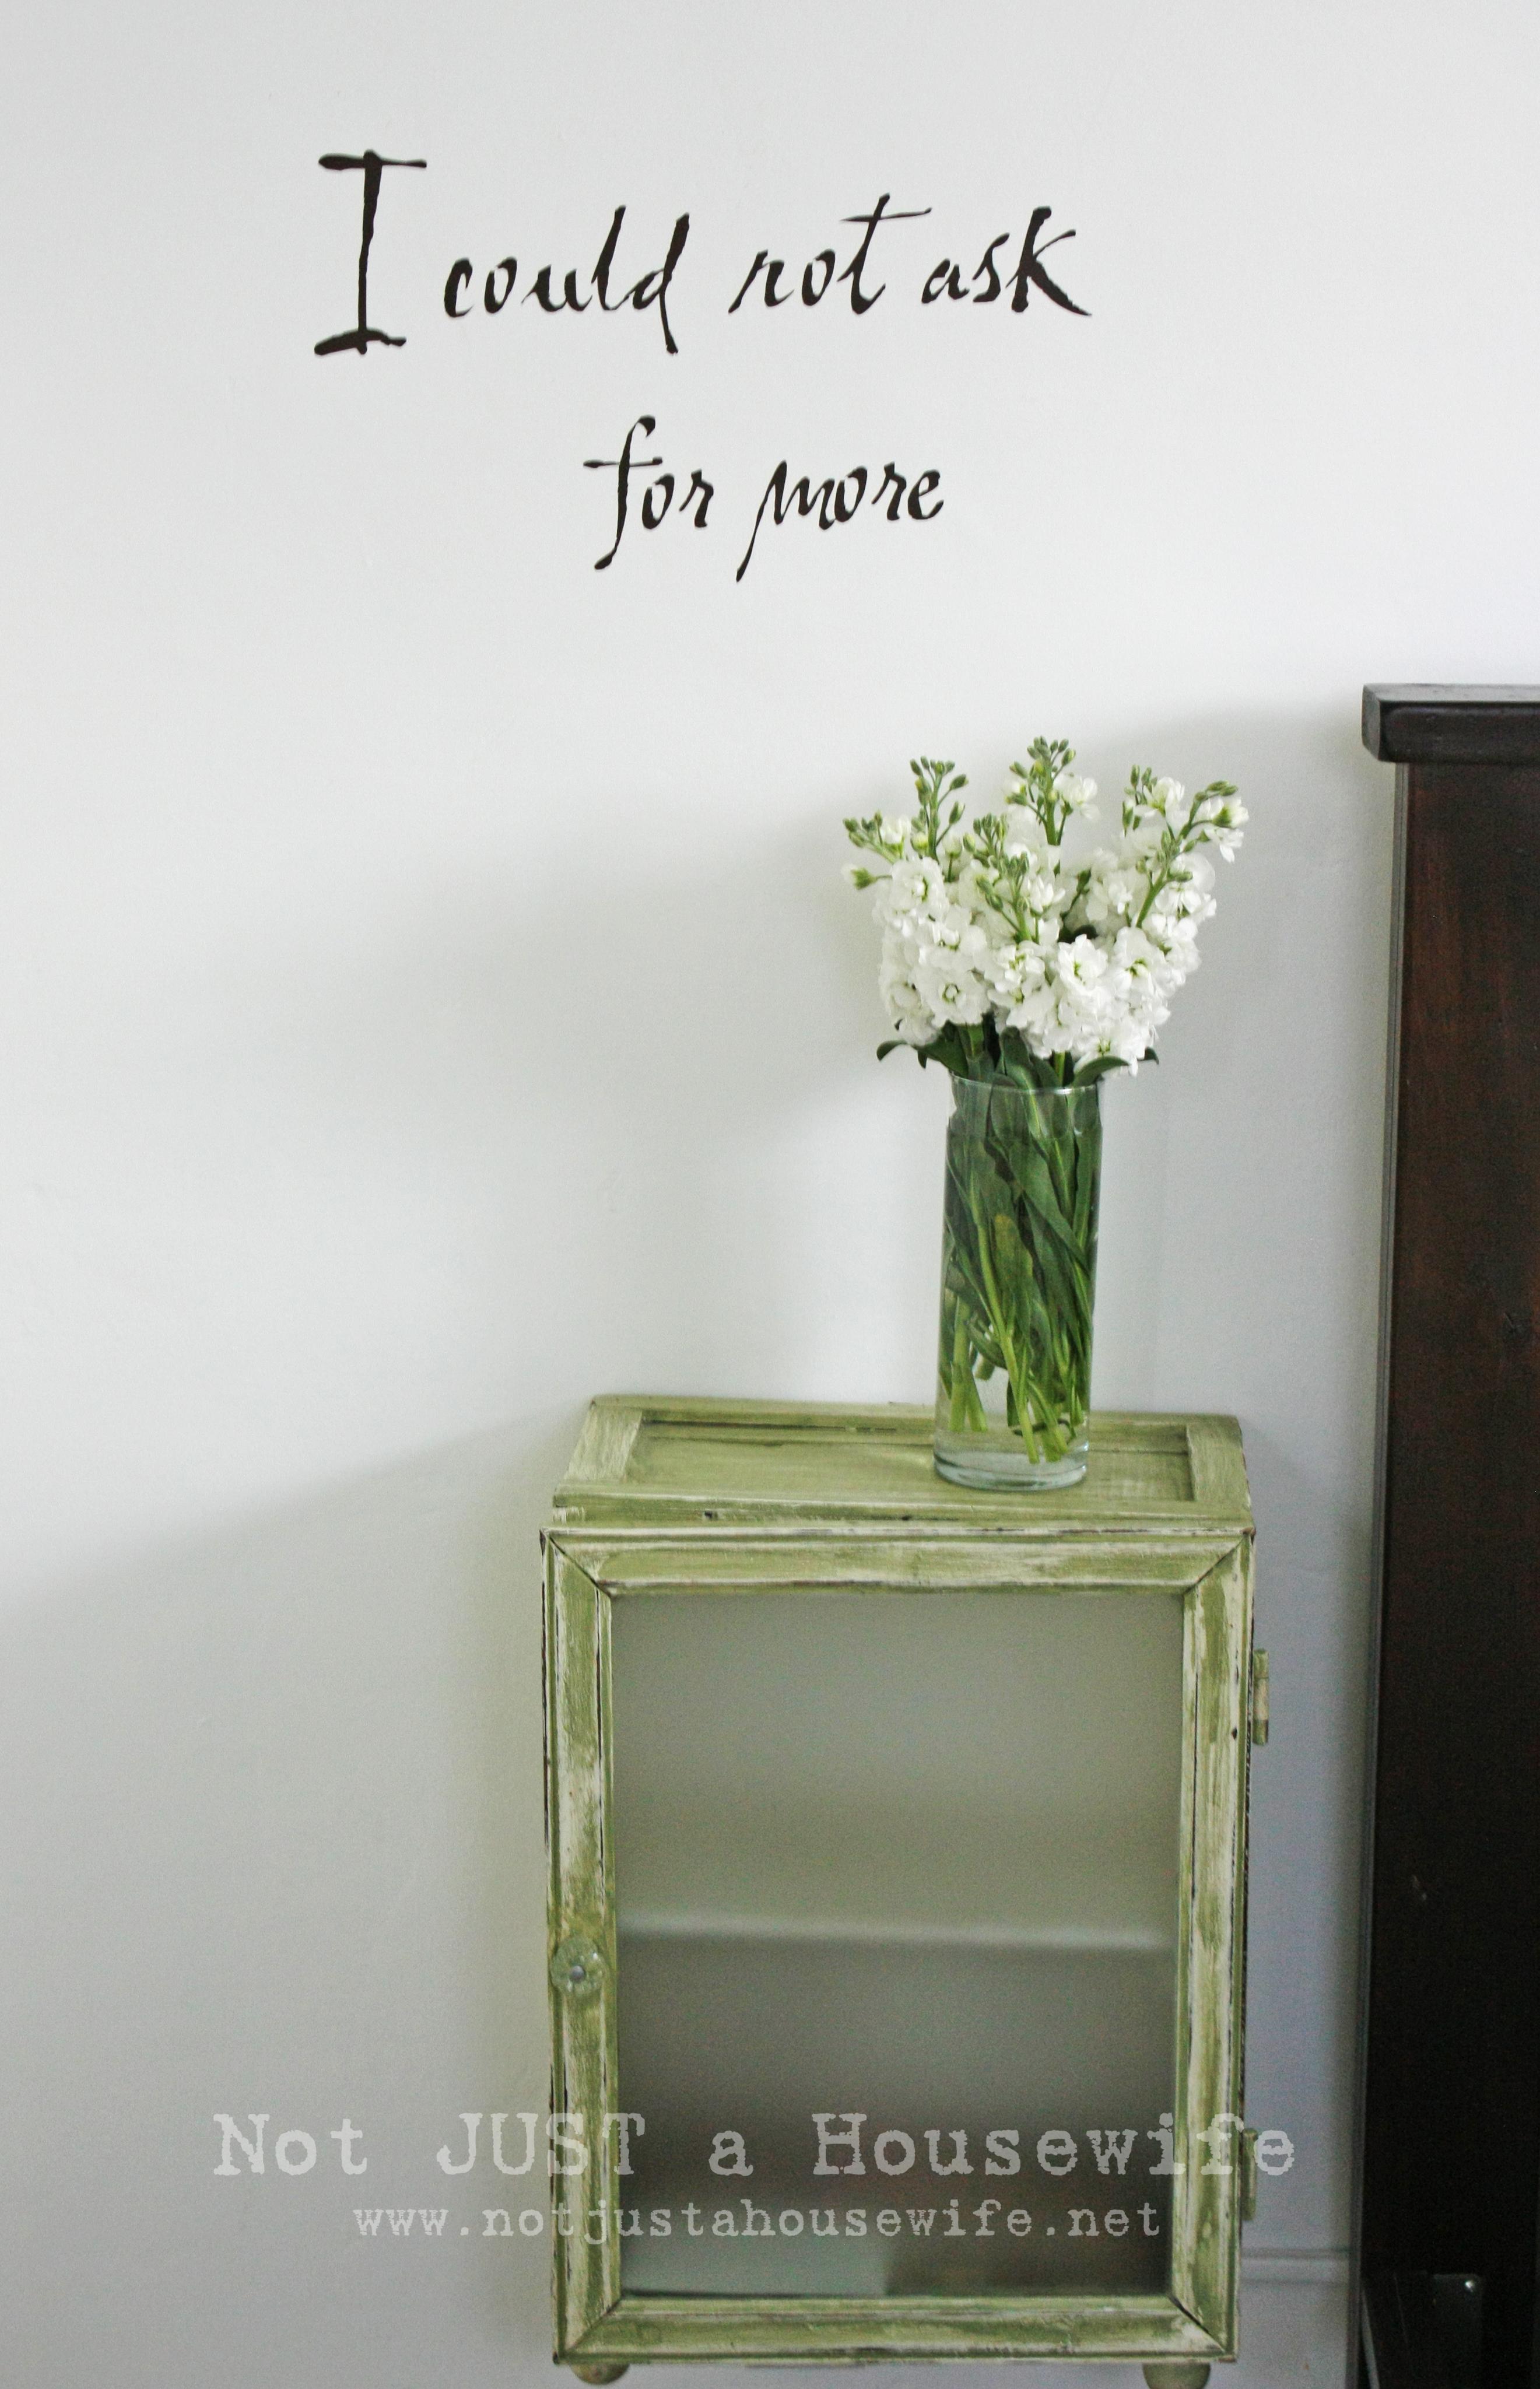 Diy master bedroom makeover - Diy Side Table For Master Bedroom Ideas